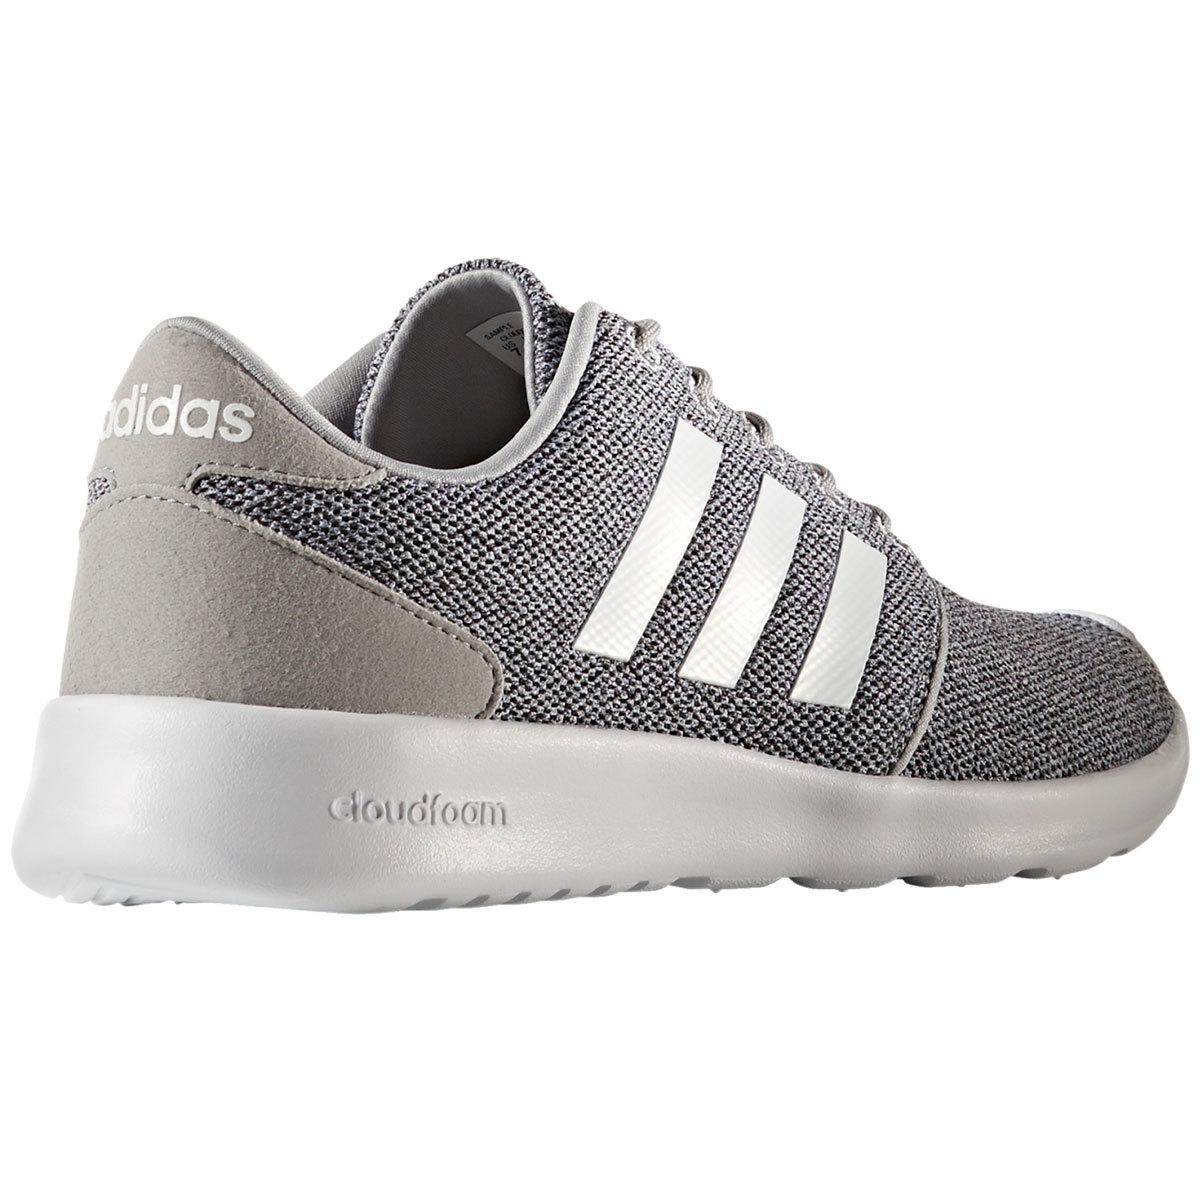 adidas cloudfoam qt racer gray